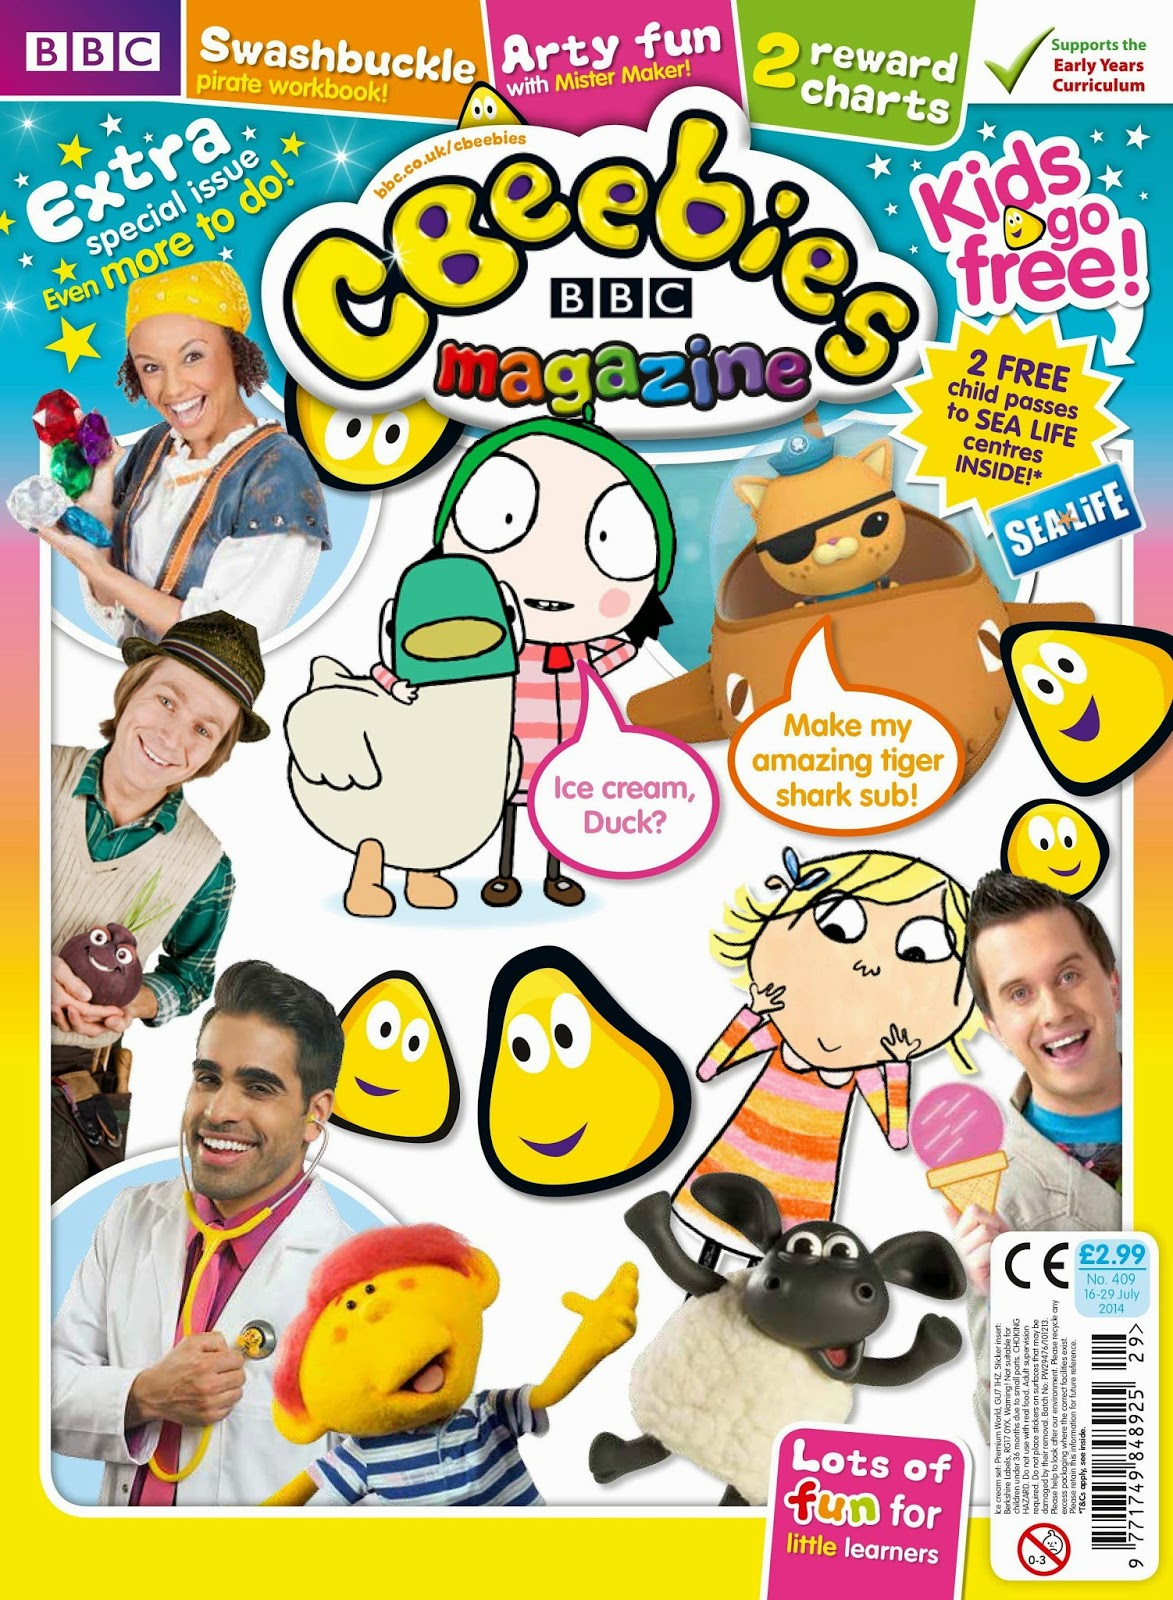 CBeebies Magazine, Merlin Entertainments, #CBeebiesMagKidsGoFree